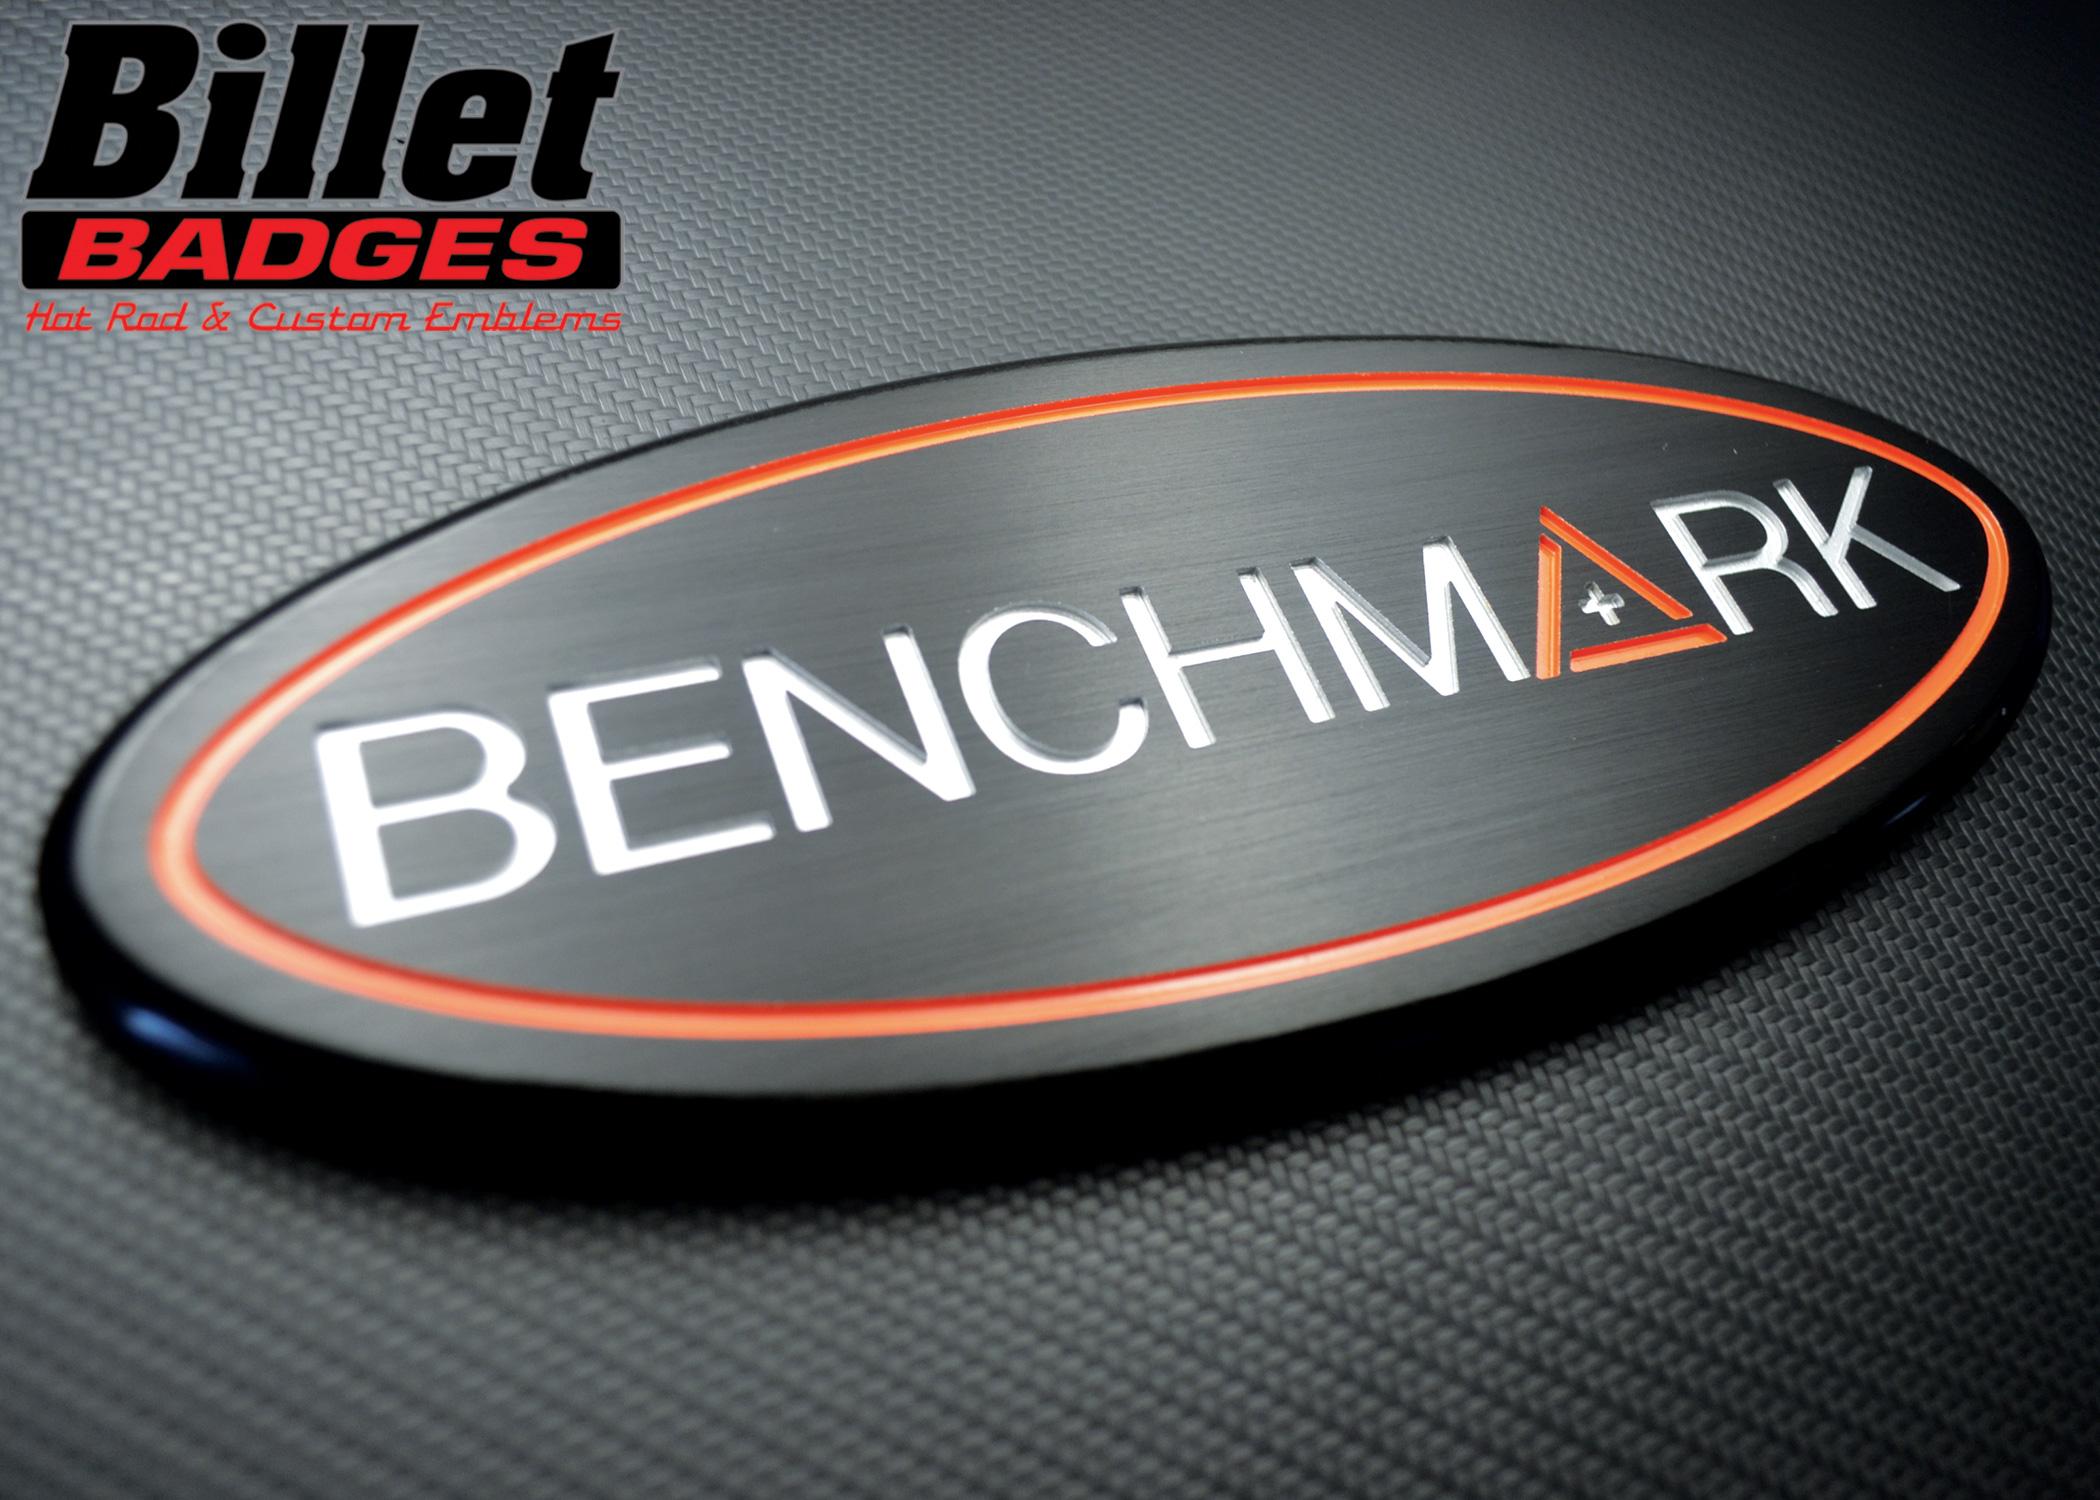 Benchmark Vehicles